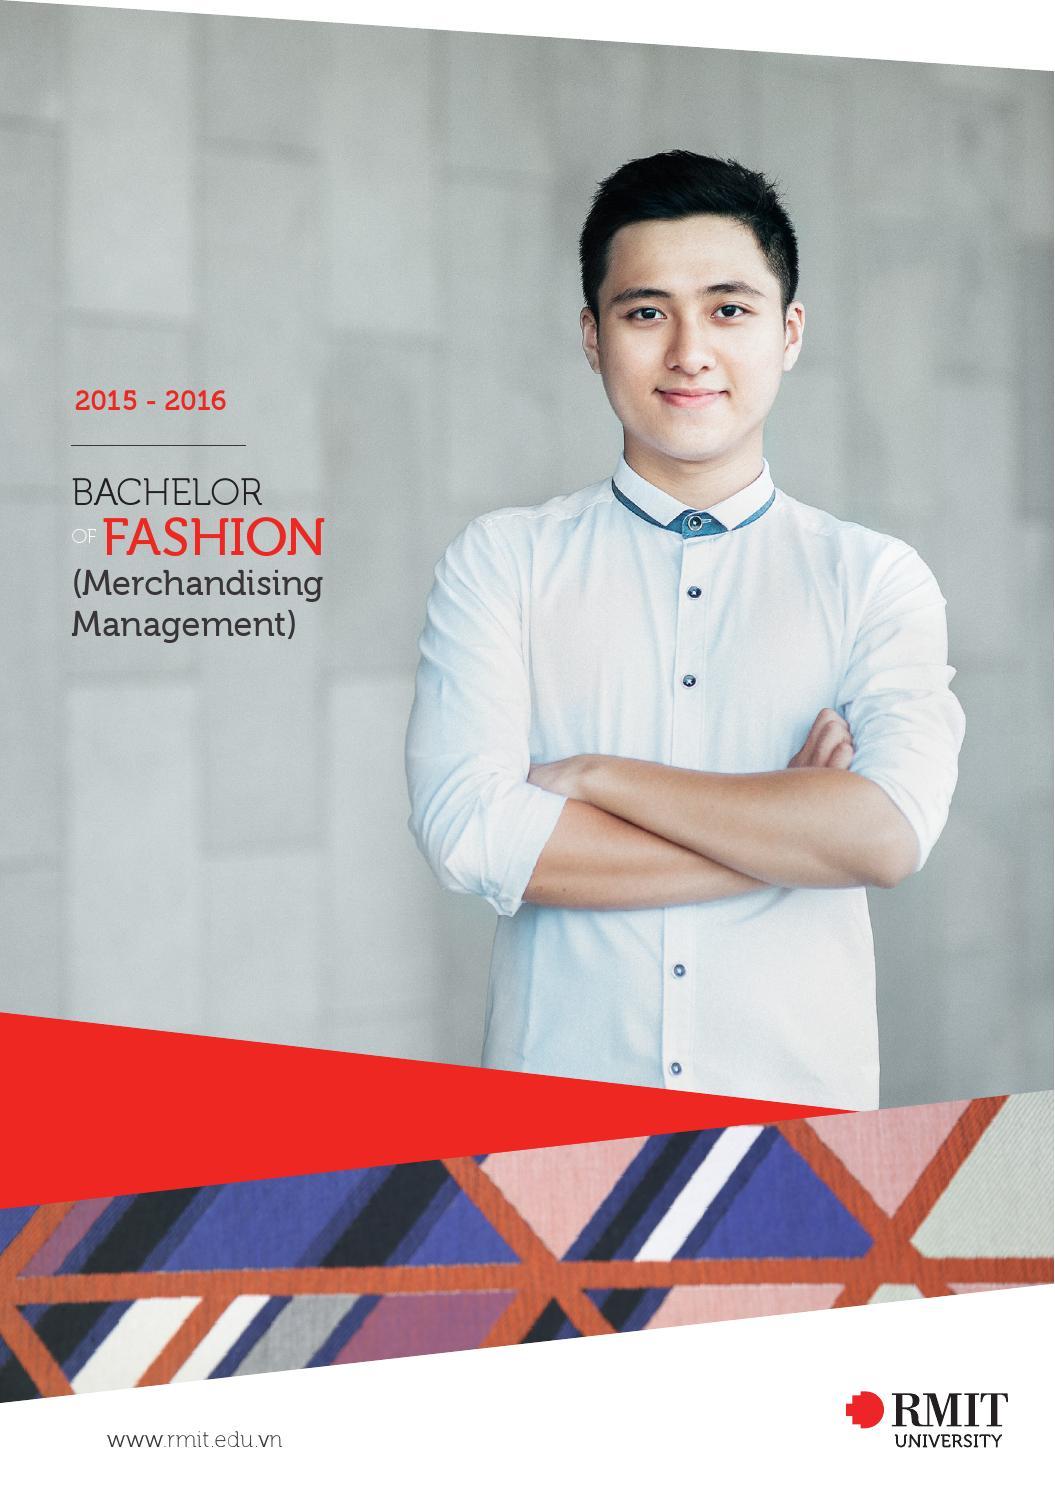 LIM fashion merchandising essay for admission?